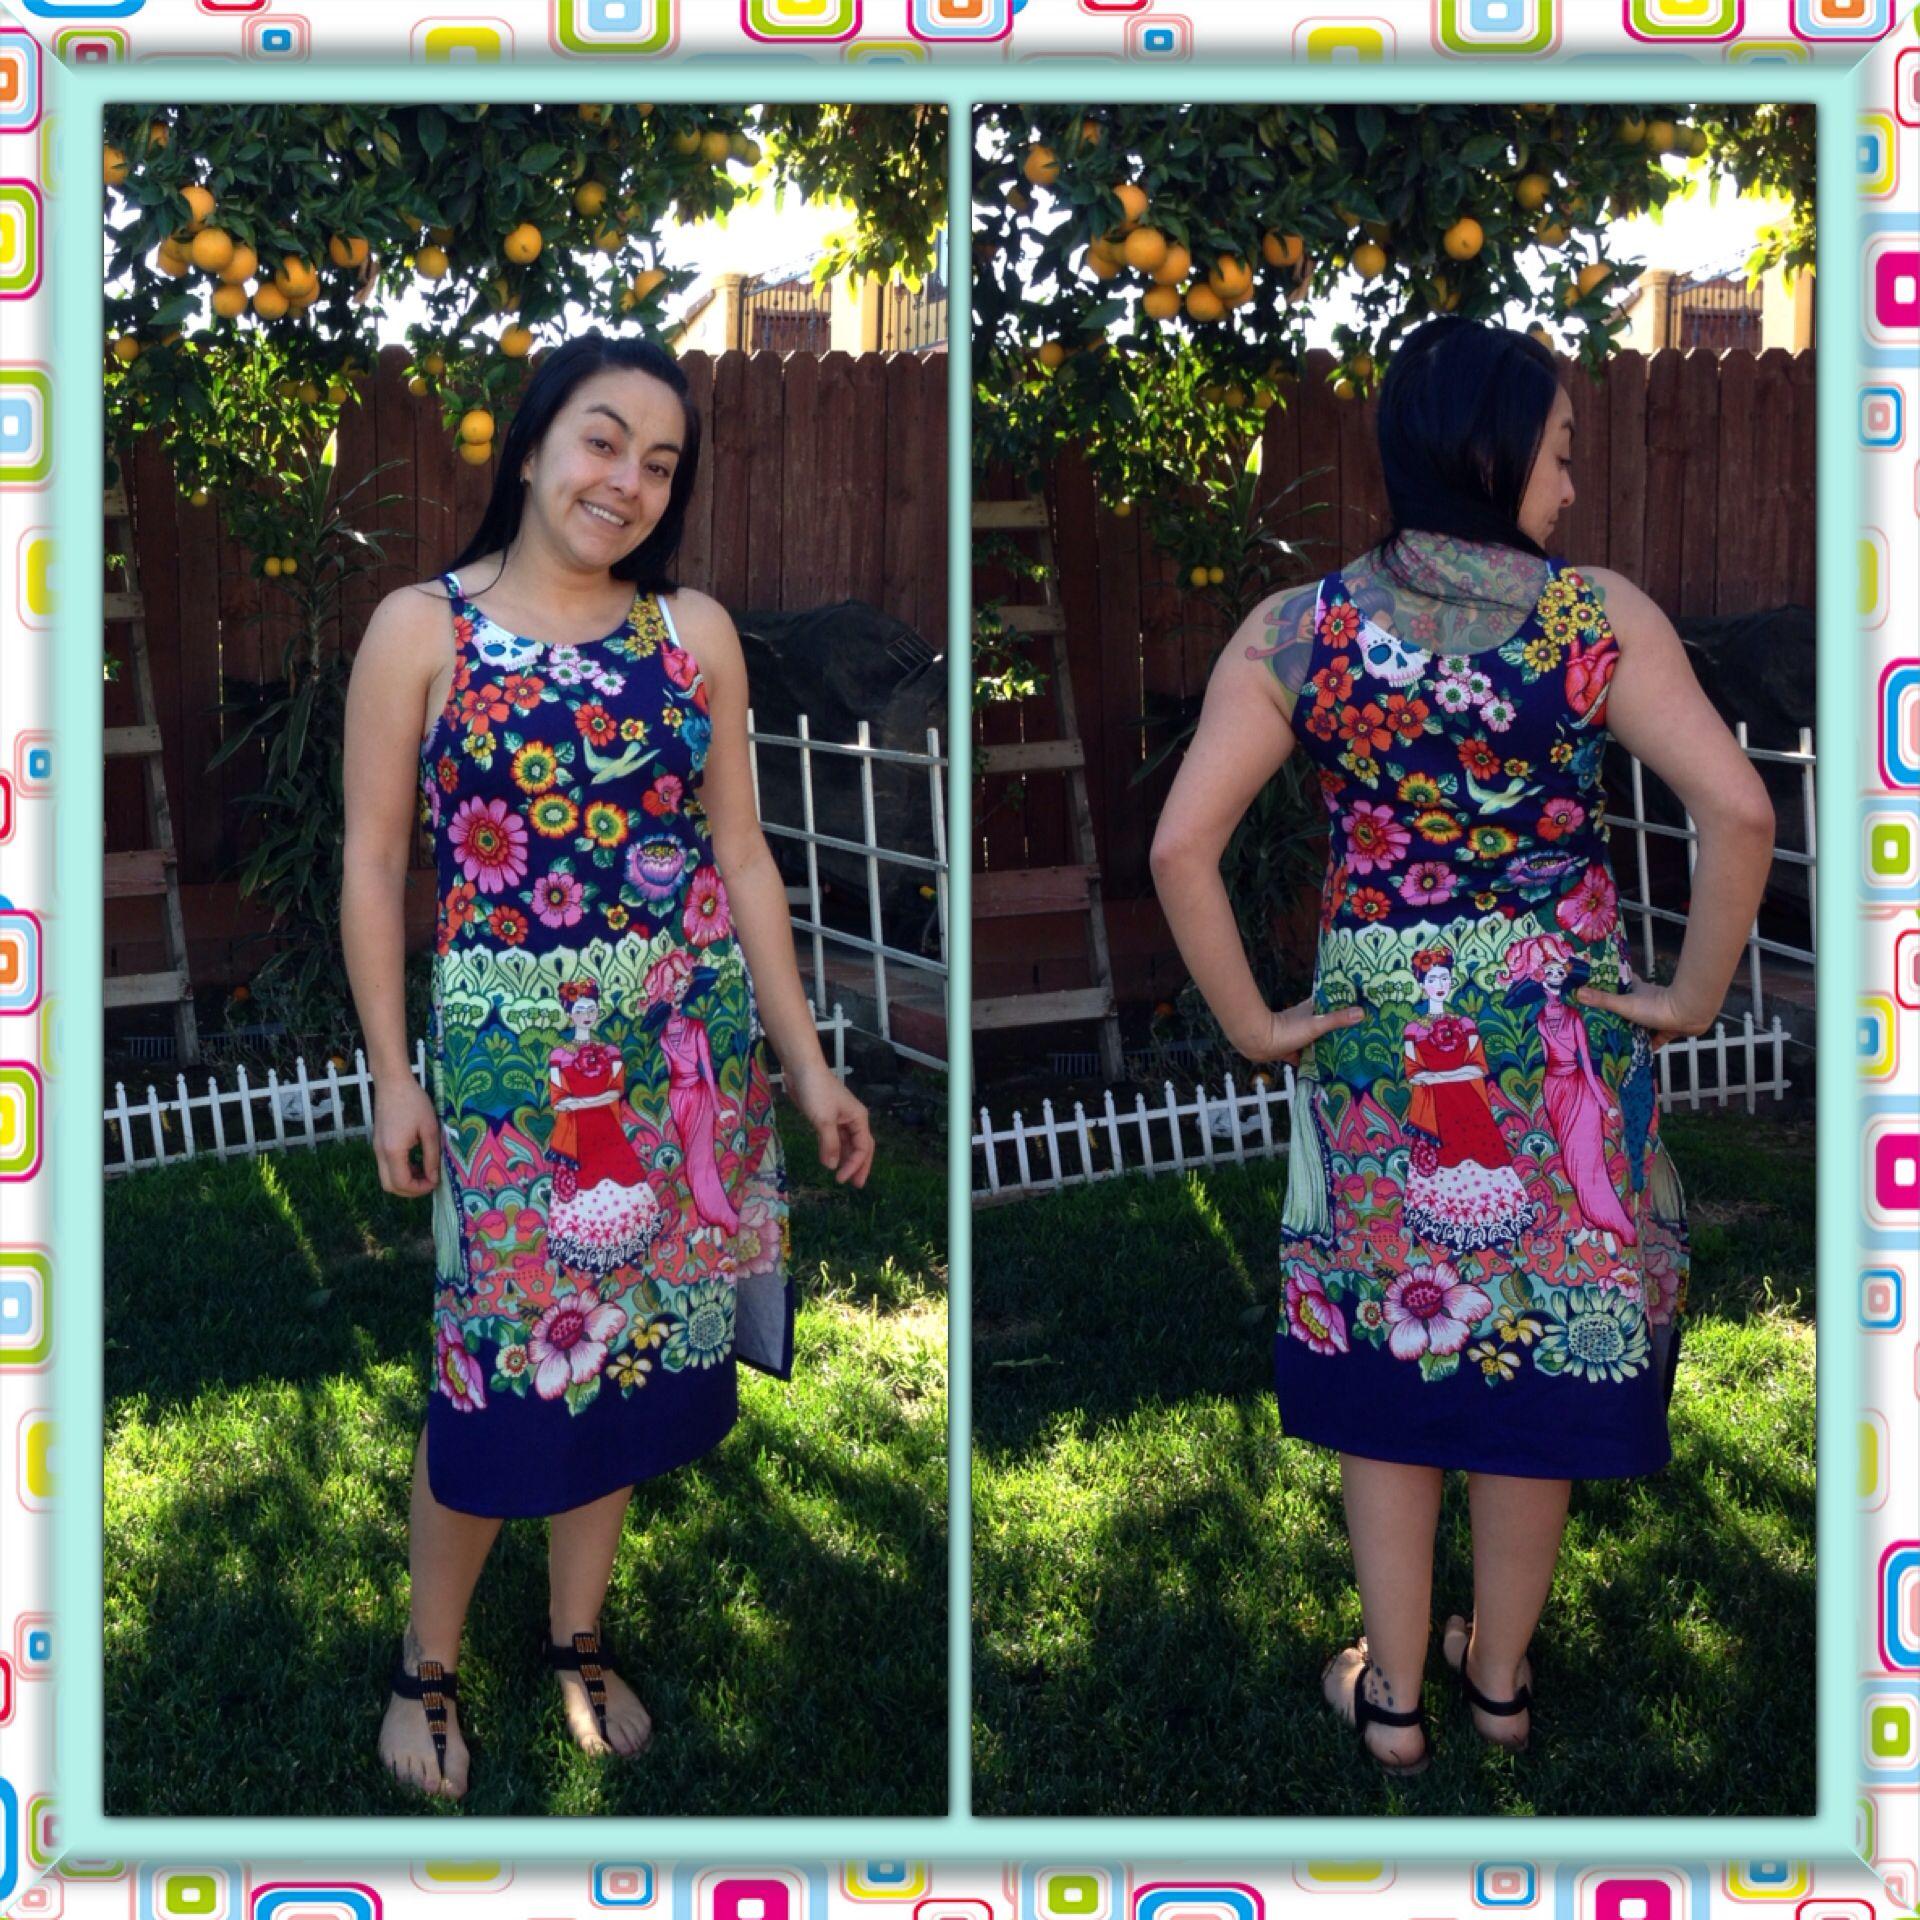 "Lina's dress. Alexander Henry fabrics collection. ""Frida la catrina"" by De León Design group. Lina is ready for México beaches!!"